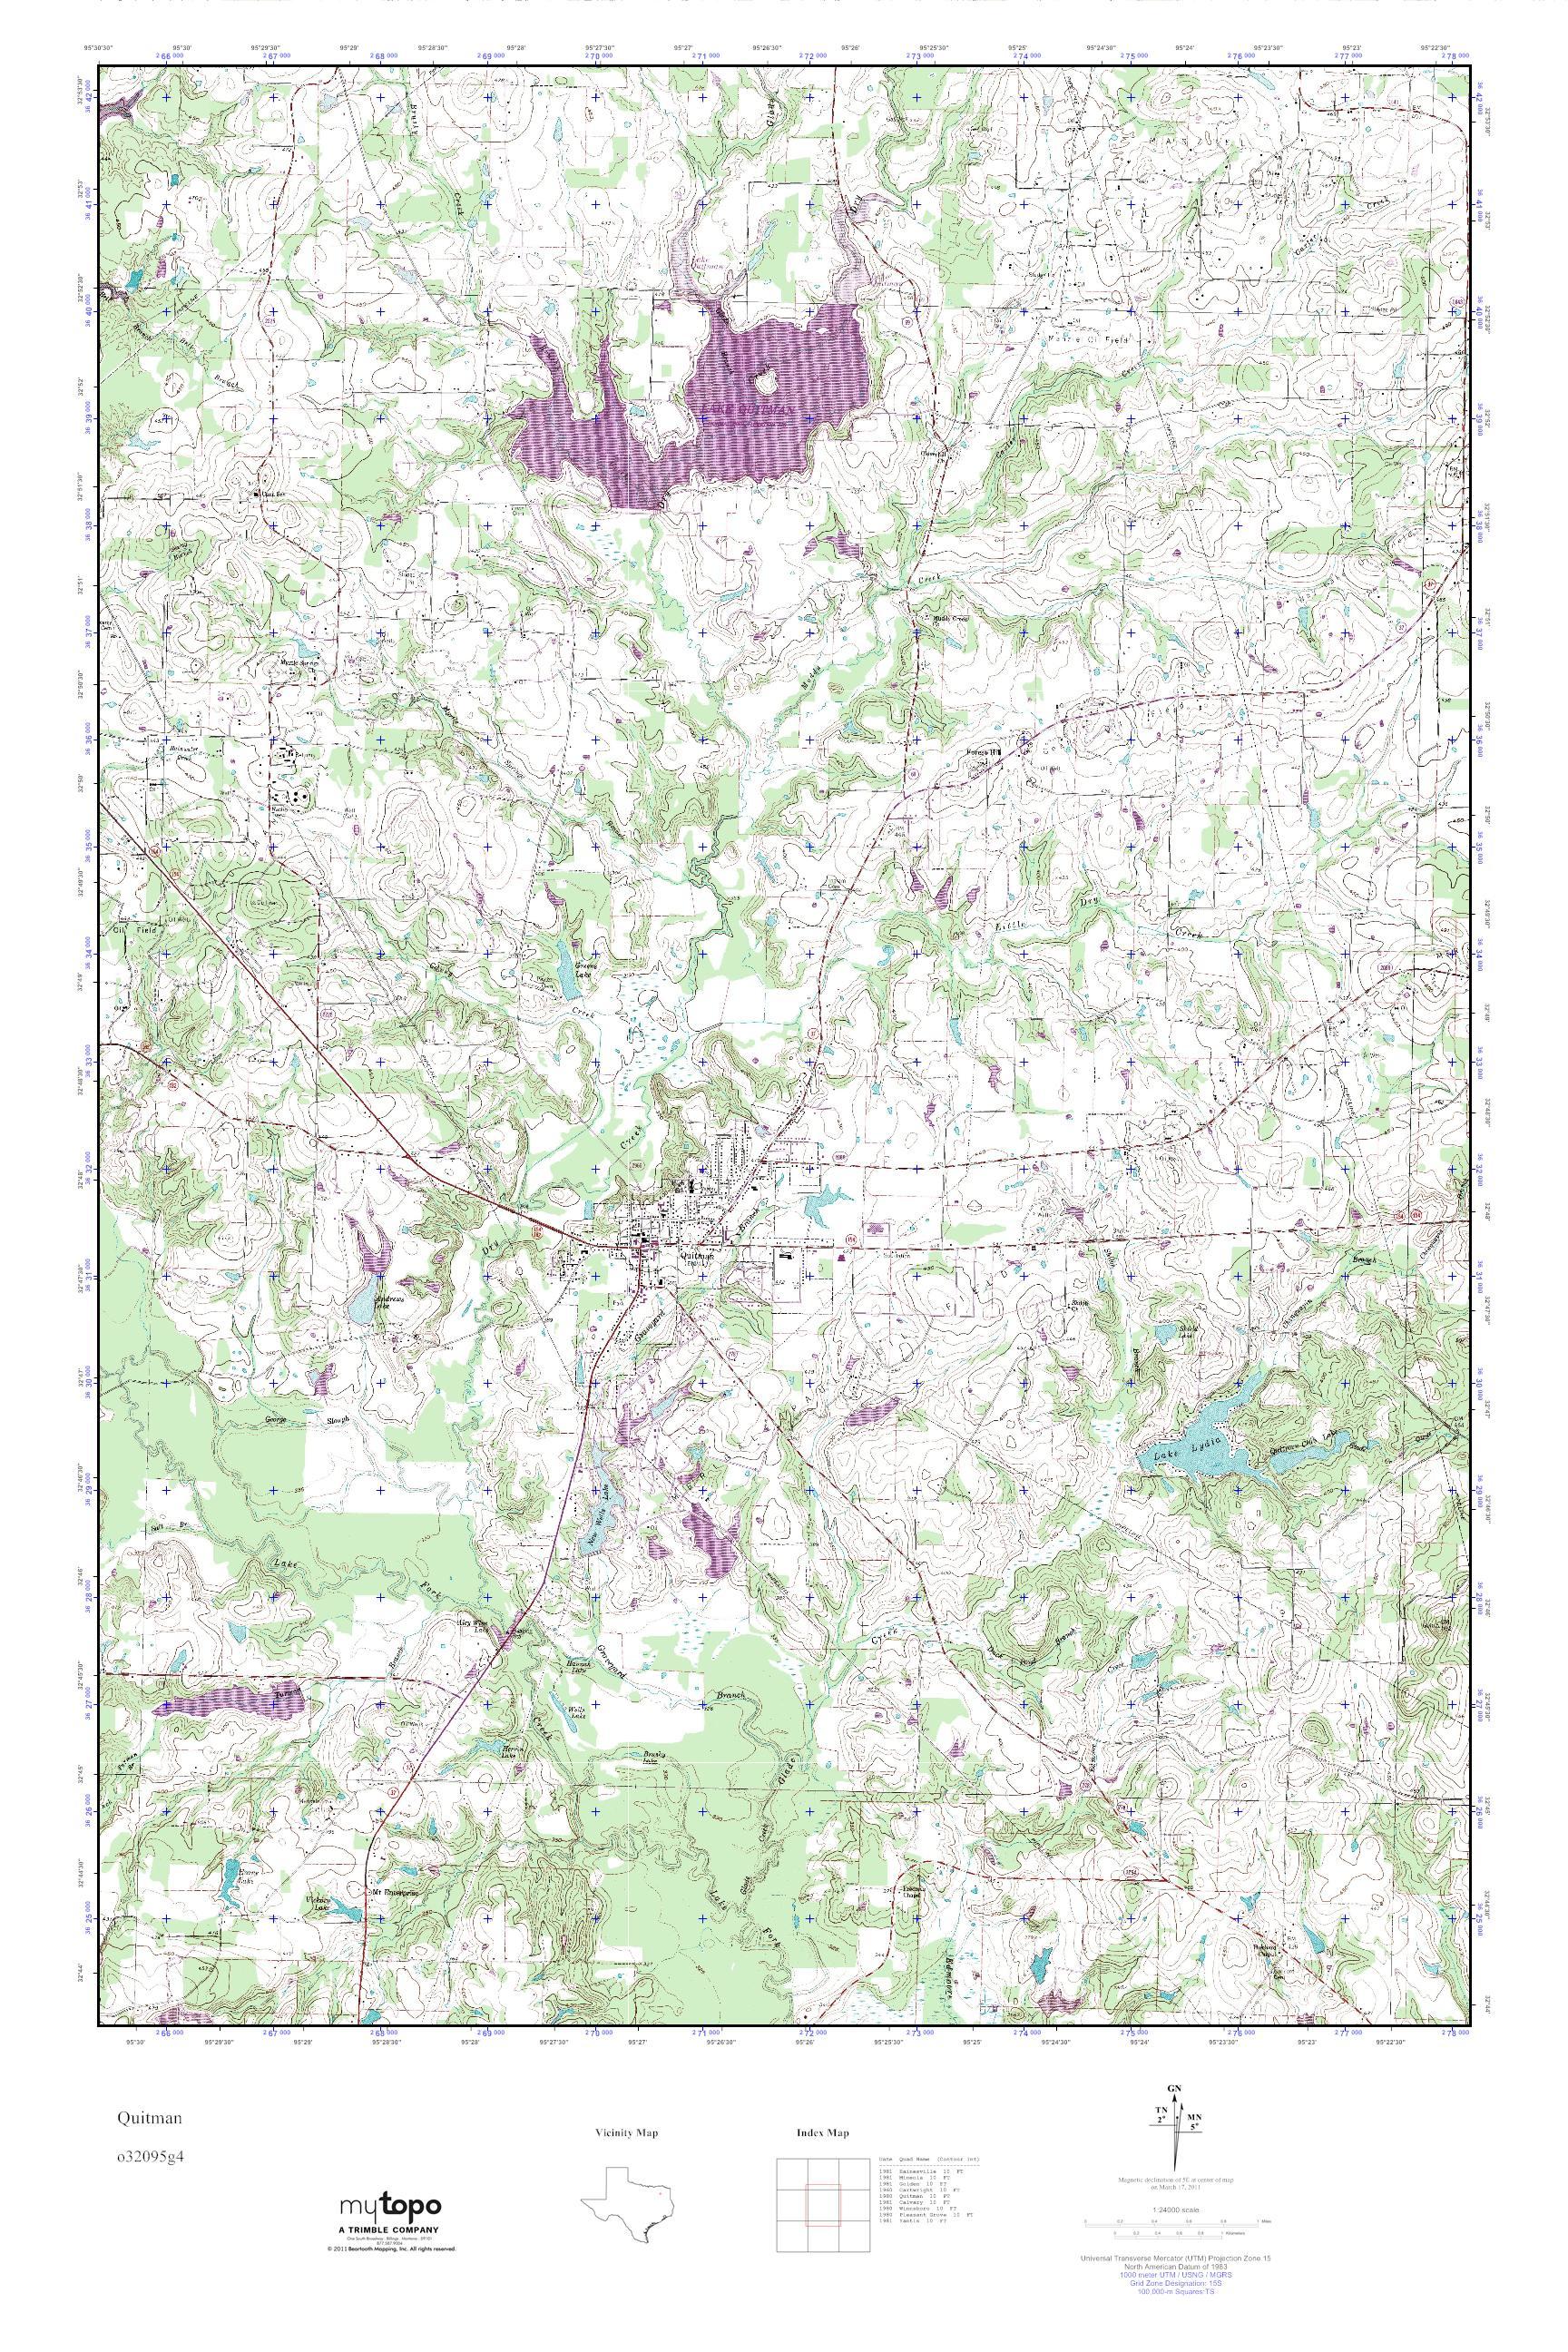 Mytopo Quitman, Texas Usgs Quad Topo Map - Quitman Texas Map